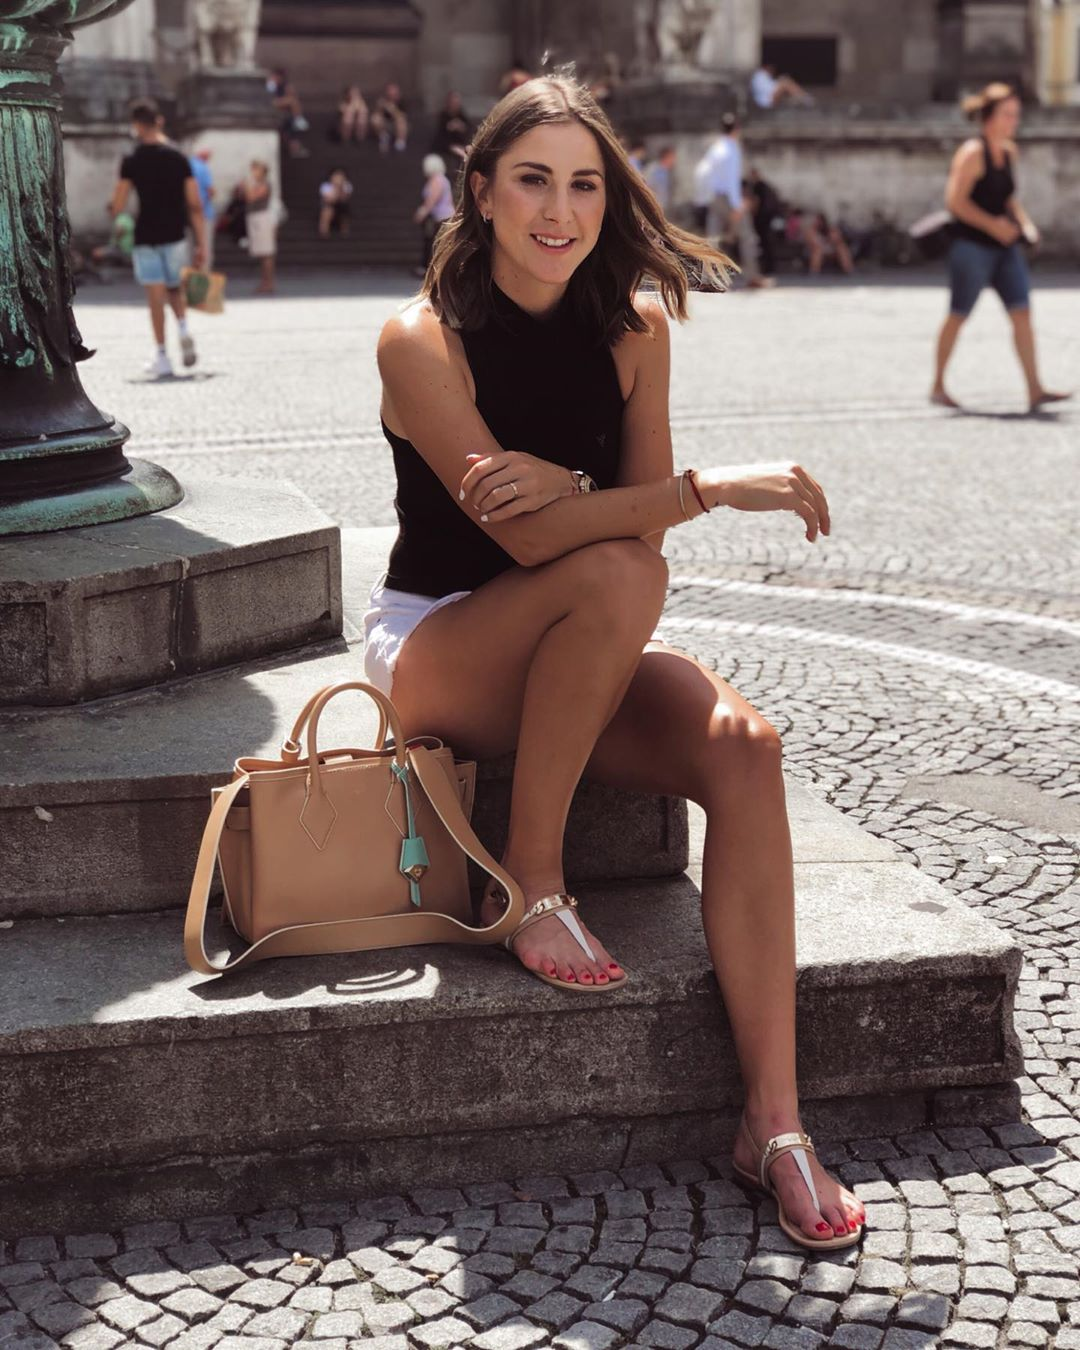 Belinda Bencic feet